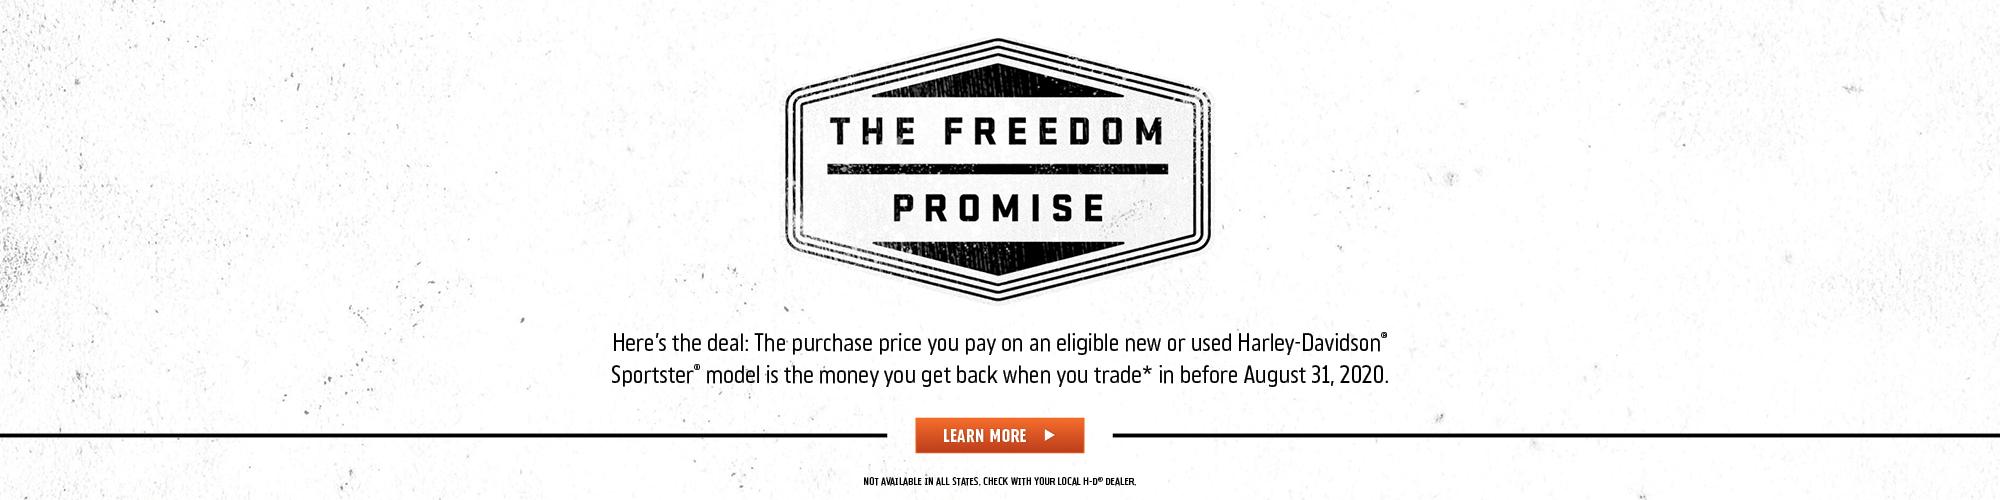 Harley-Davidson Freedom Promise at Harley-Davidson of Atlanta